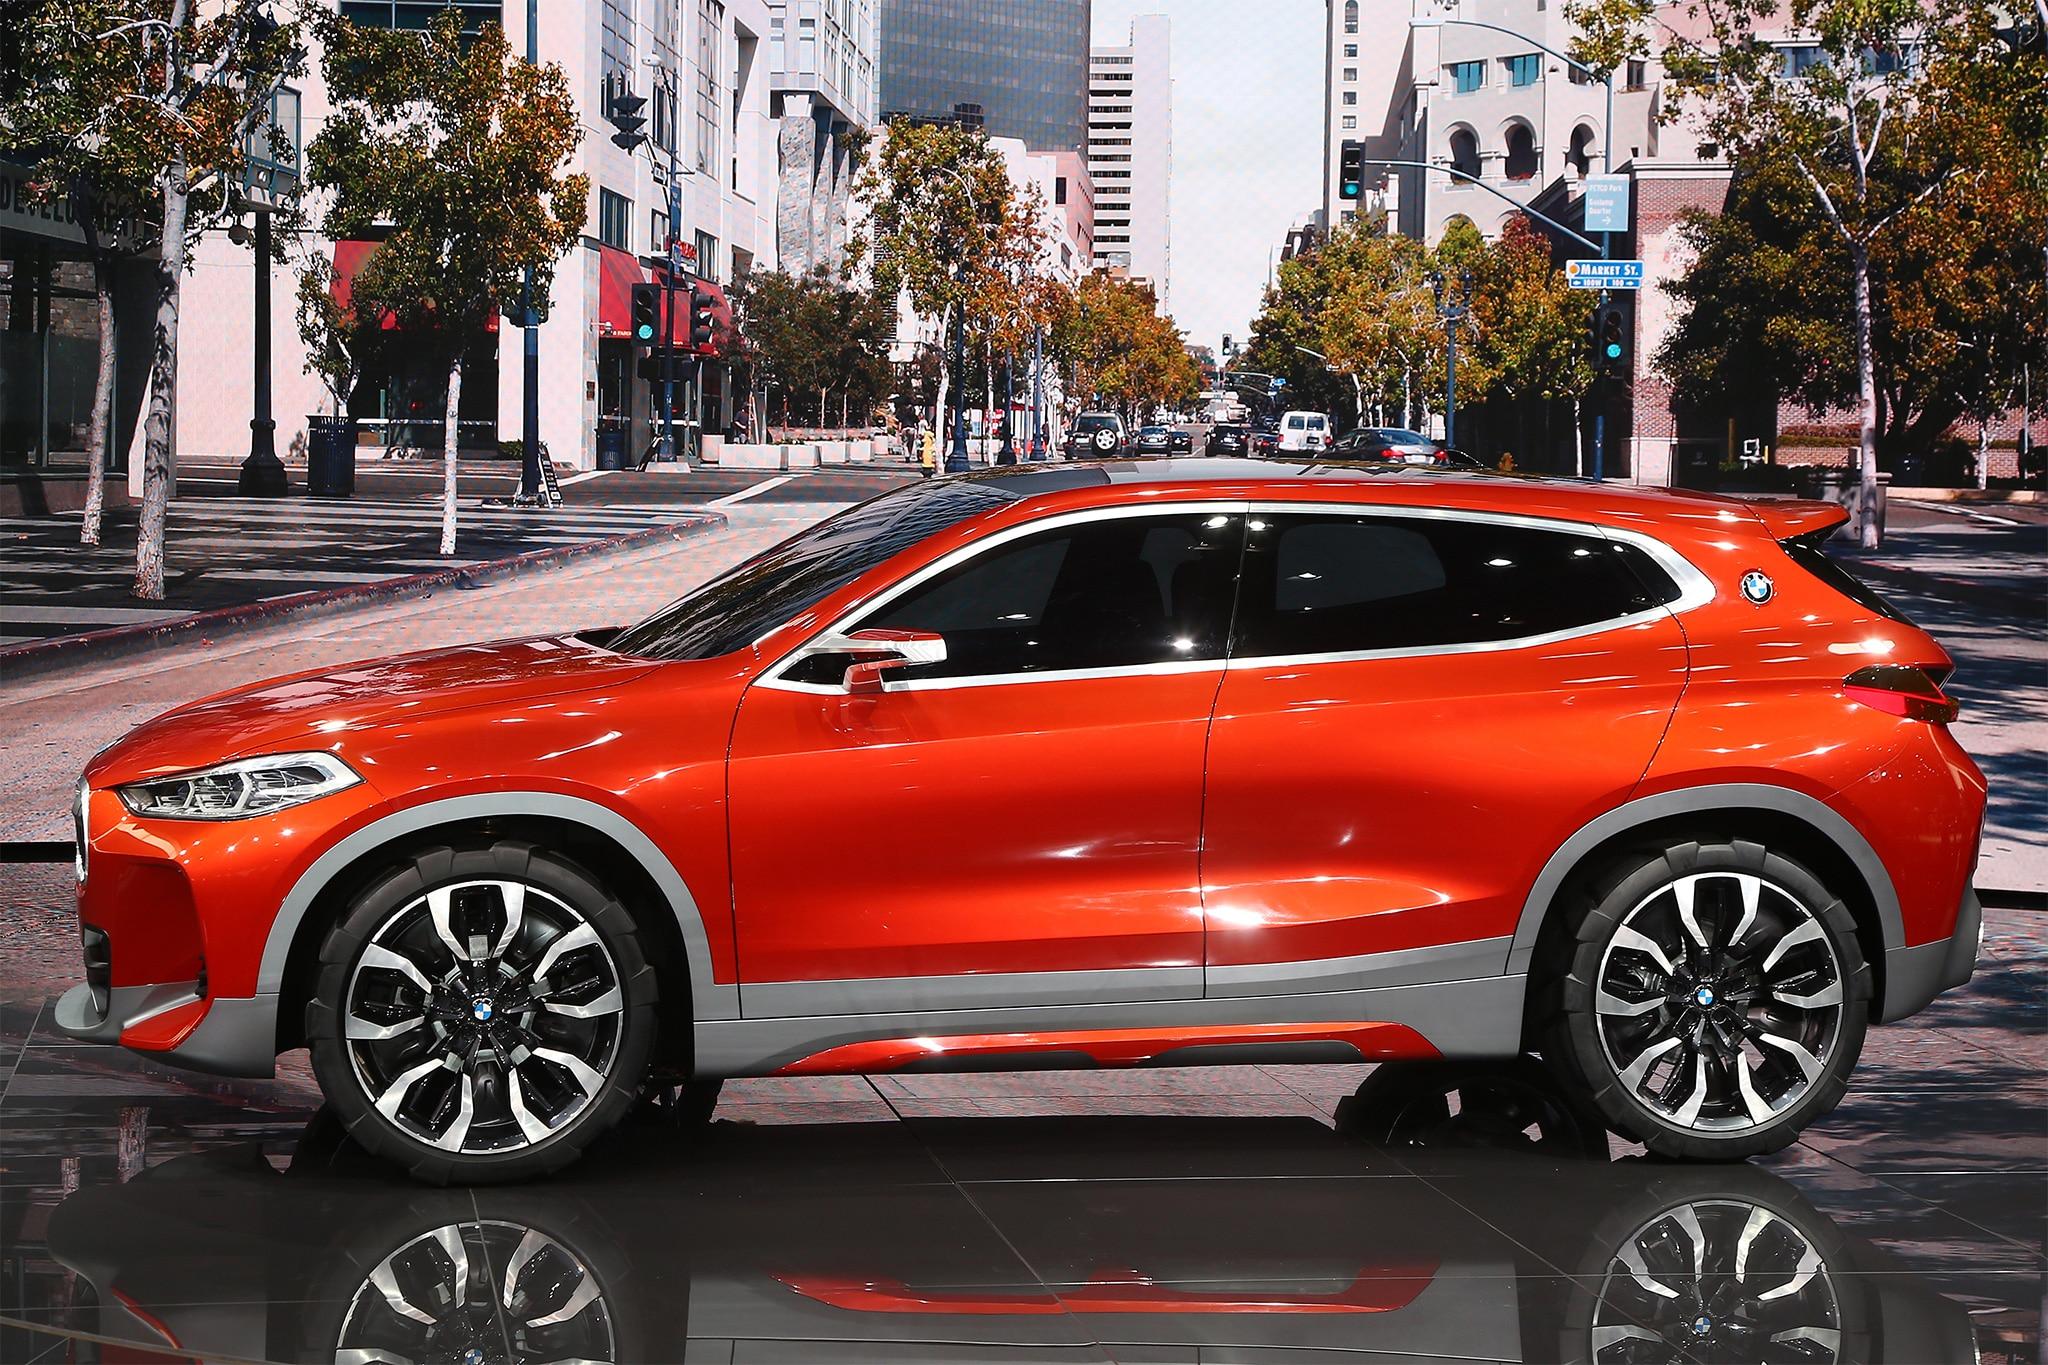 BMW X2 Concept Side Profile 03